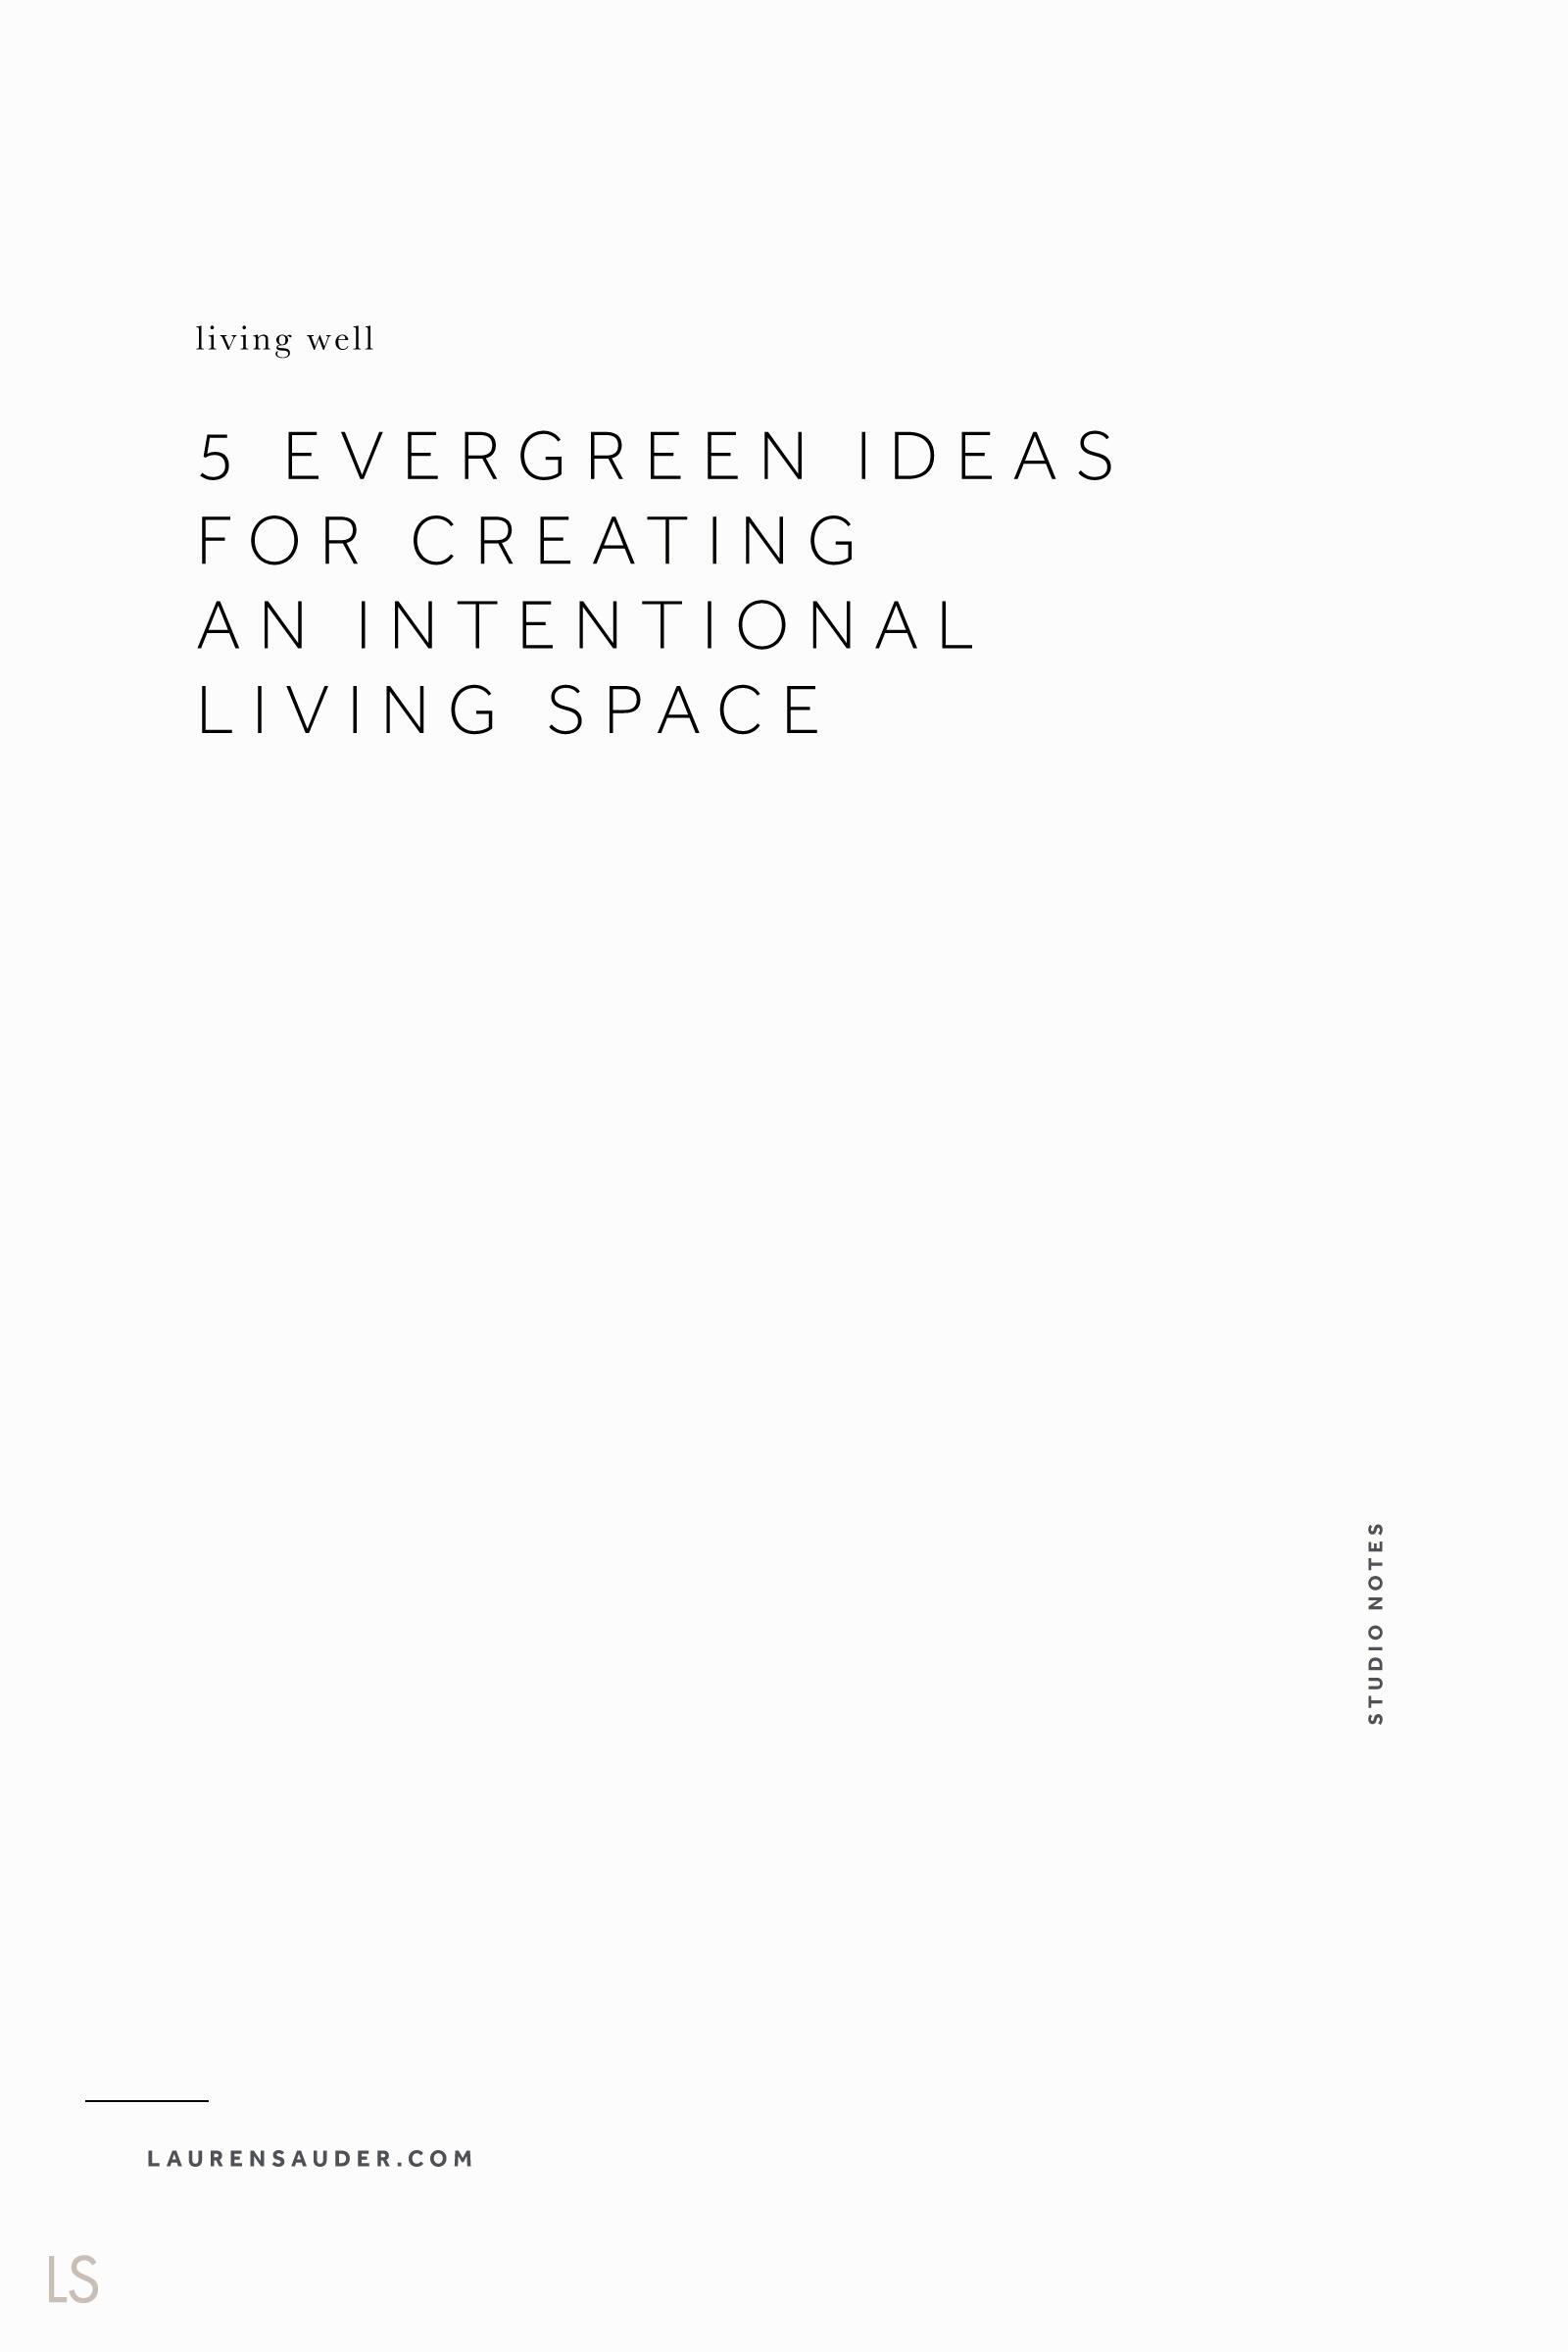 5 Evergreen Ideas for Creating an Intentional Living Space - Lauren Sauder minimal home, minimalism, slow living, simple living, declutter